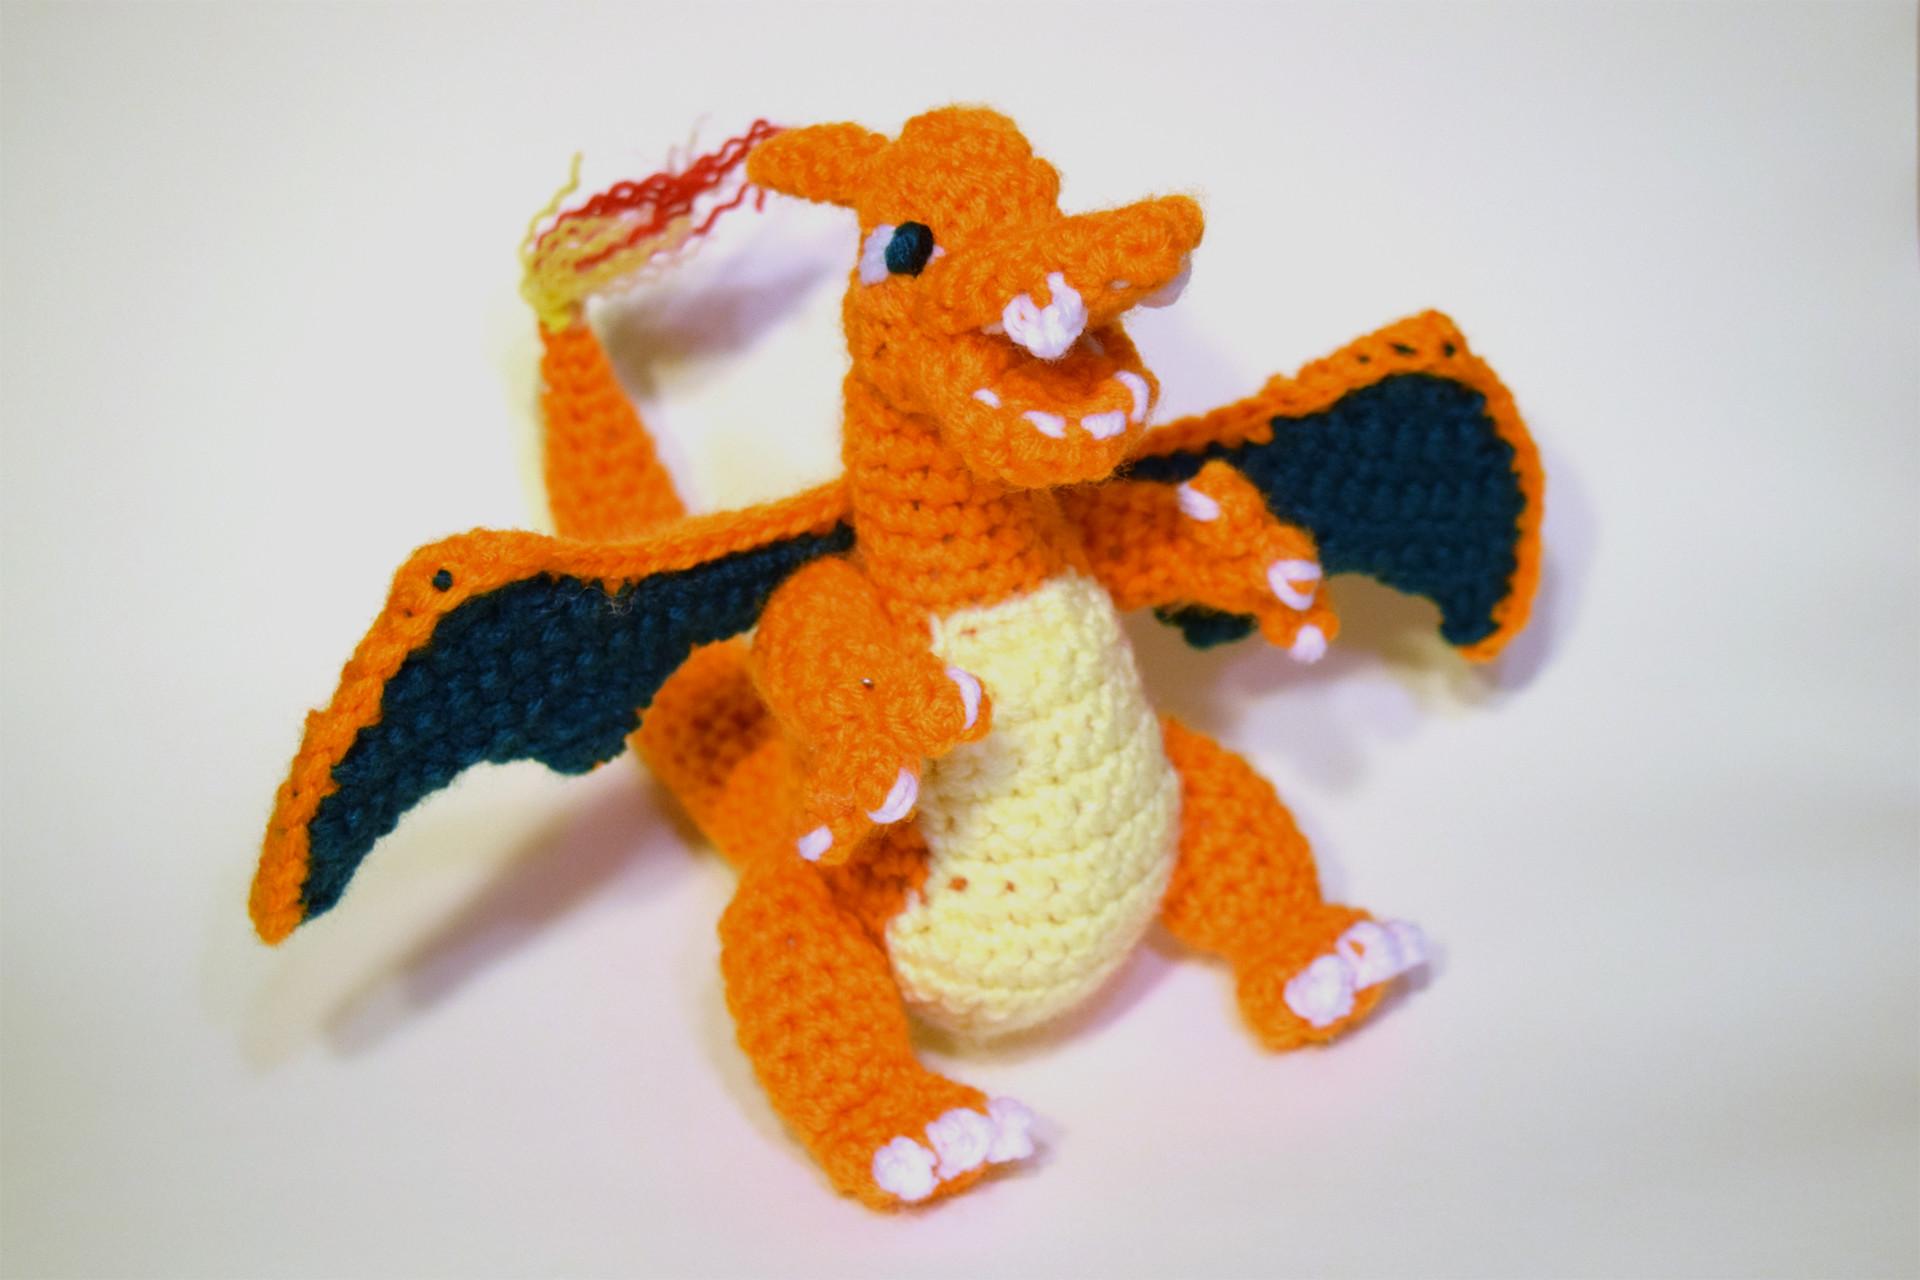 Hand-made Crochet Pokemon Charizard Amigurumi Look-alike | Etsy | 1280x1920